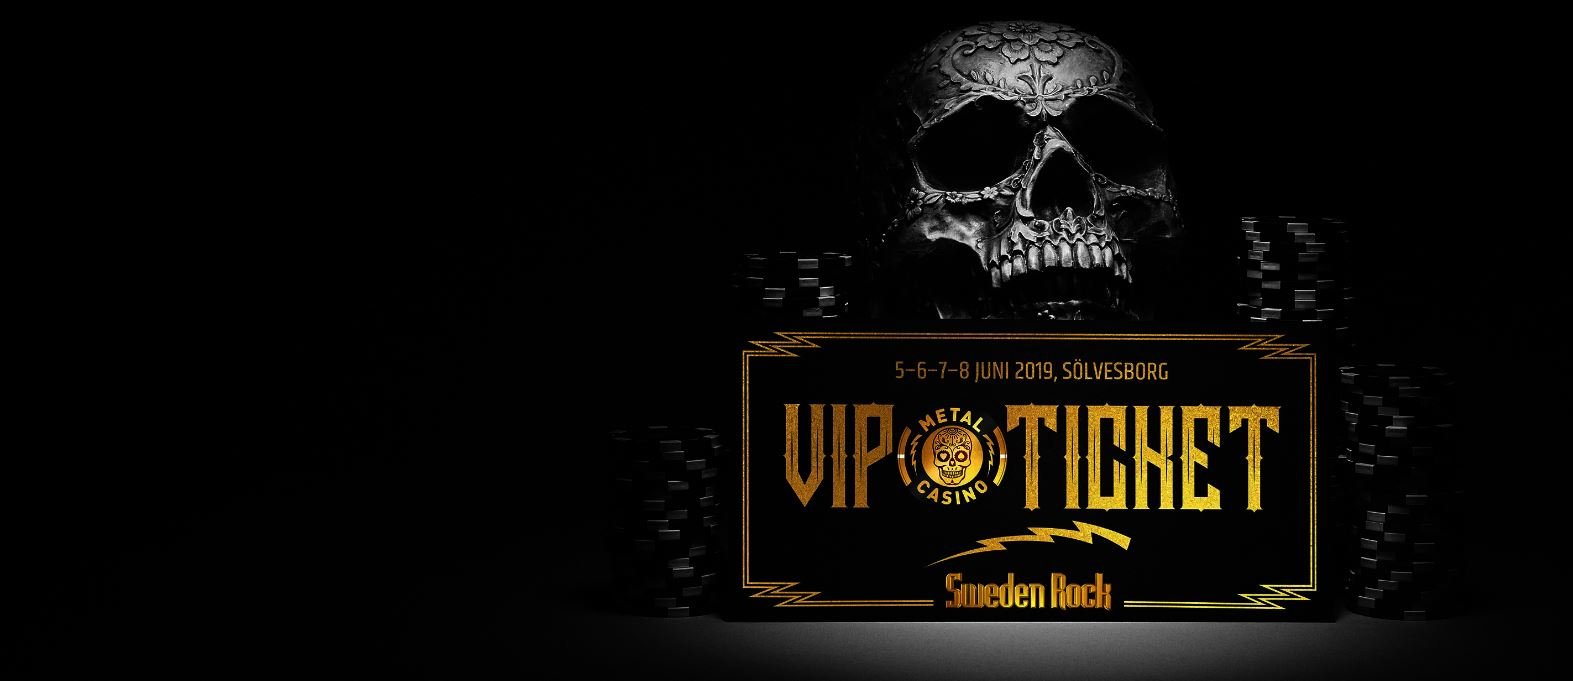 Giveaway från Metal Casino – Sweden Rock VIP-biljetter